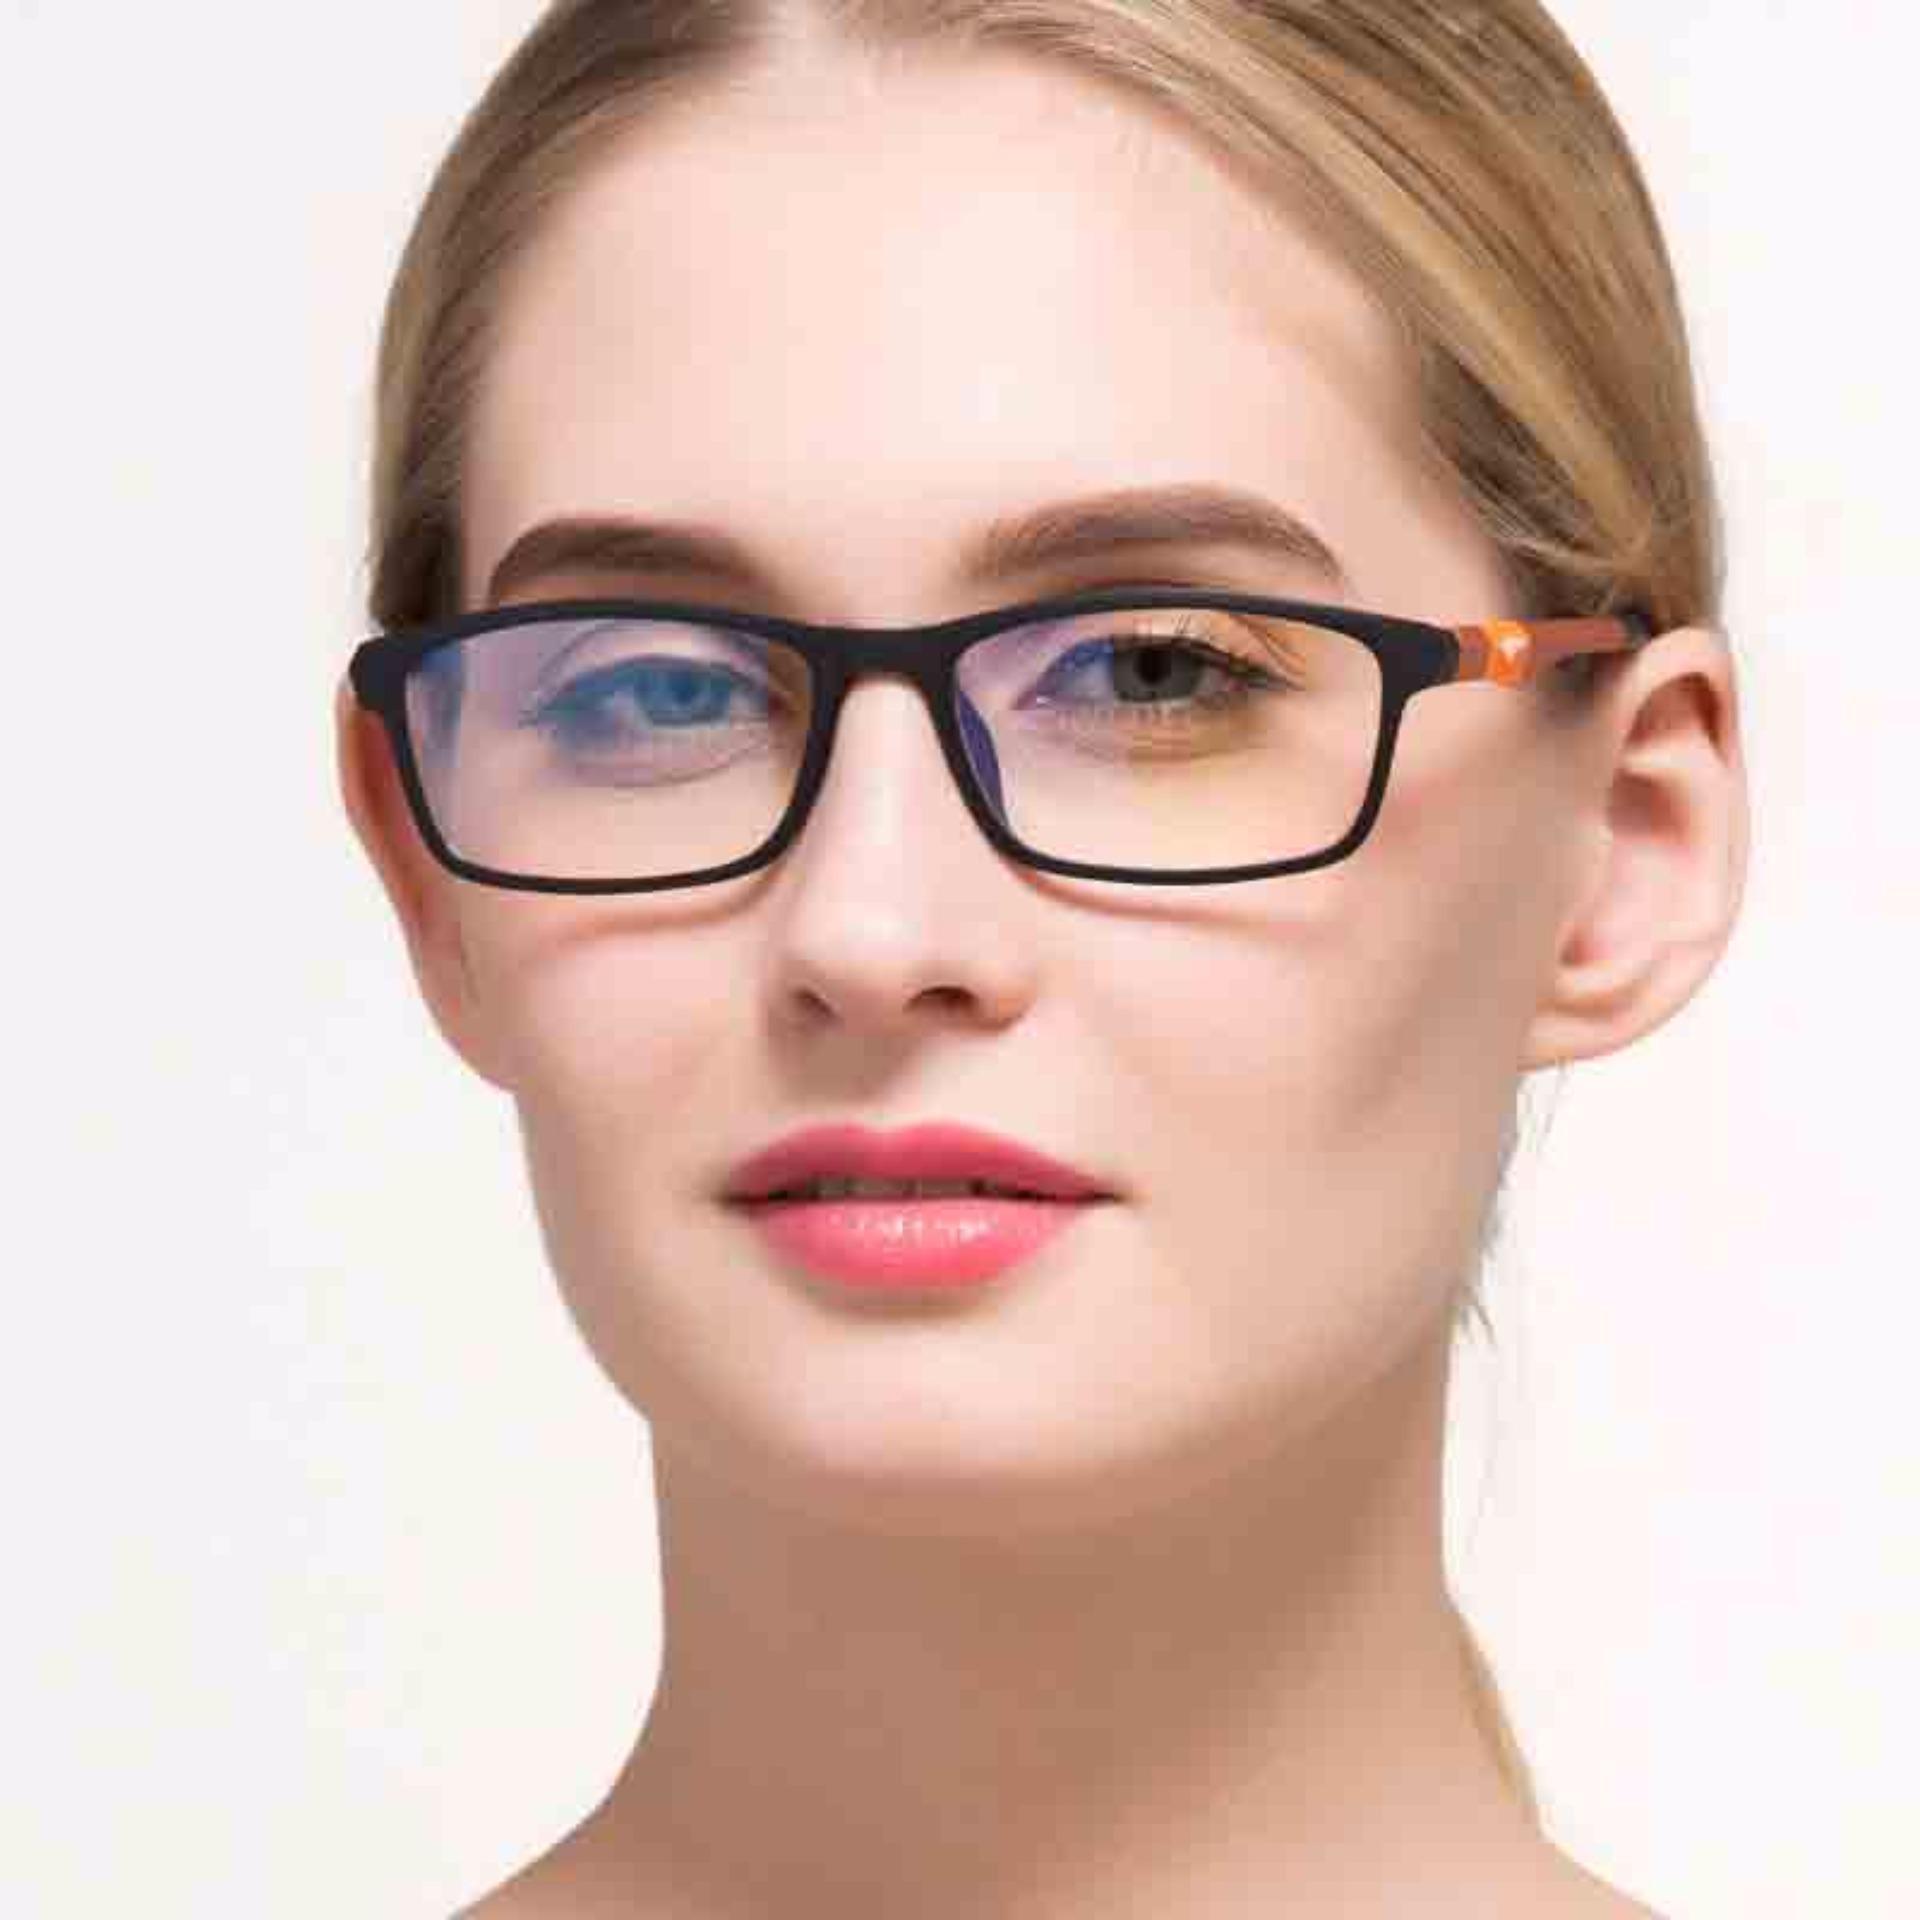 ... KATELUO 2017 New Brand Reading Glasses Men Woman Computer UVGlassesFatigue Radiation eyeglasses Myopia Frame Black WhiteBule13022 ...